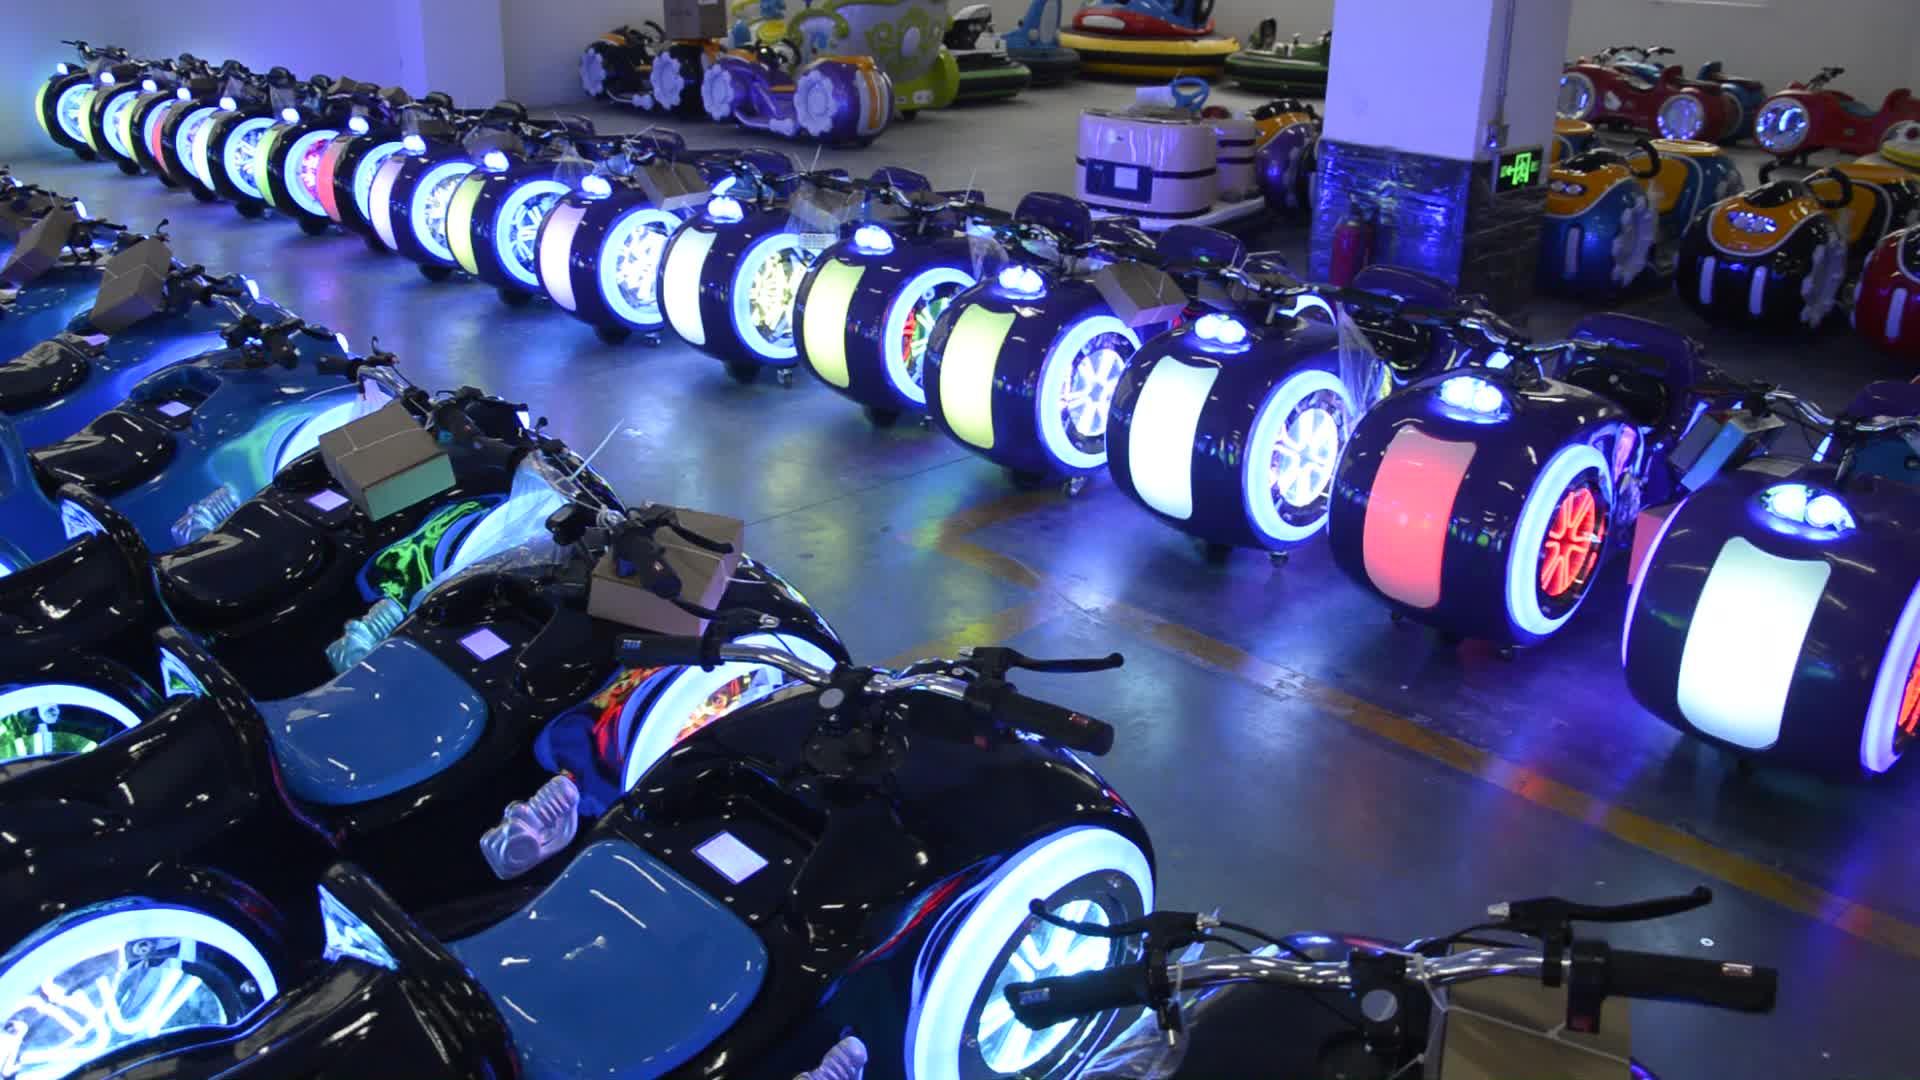 Hansel Indoor playground amusement park battery motor bikes